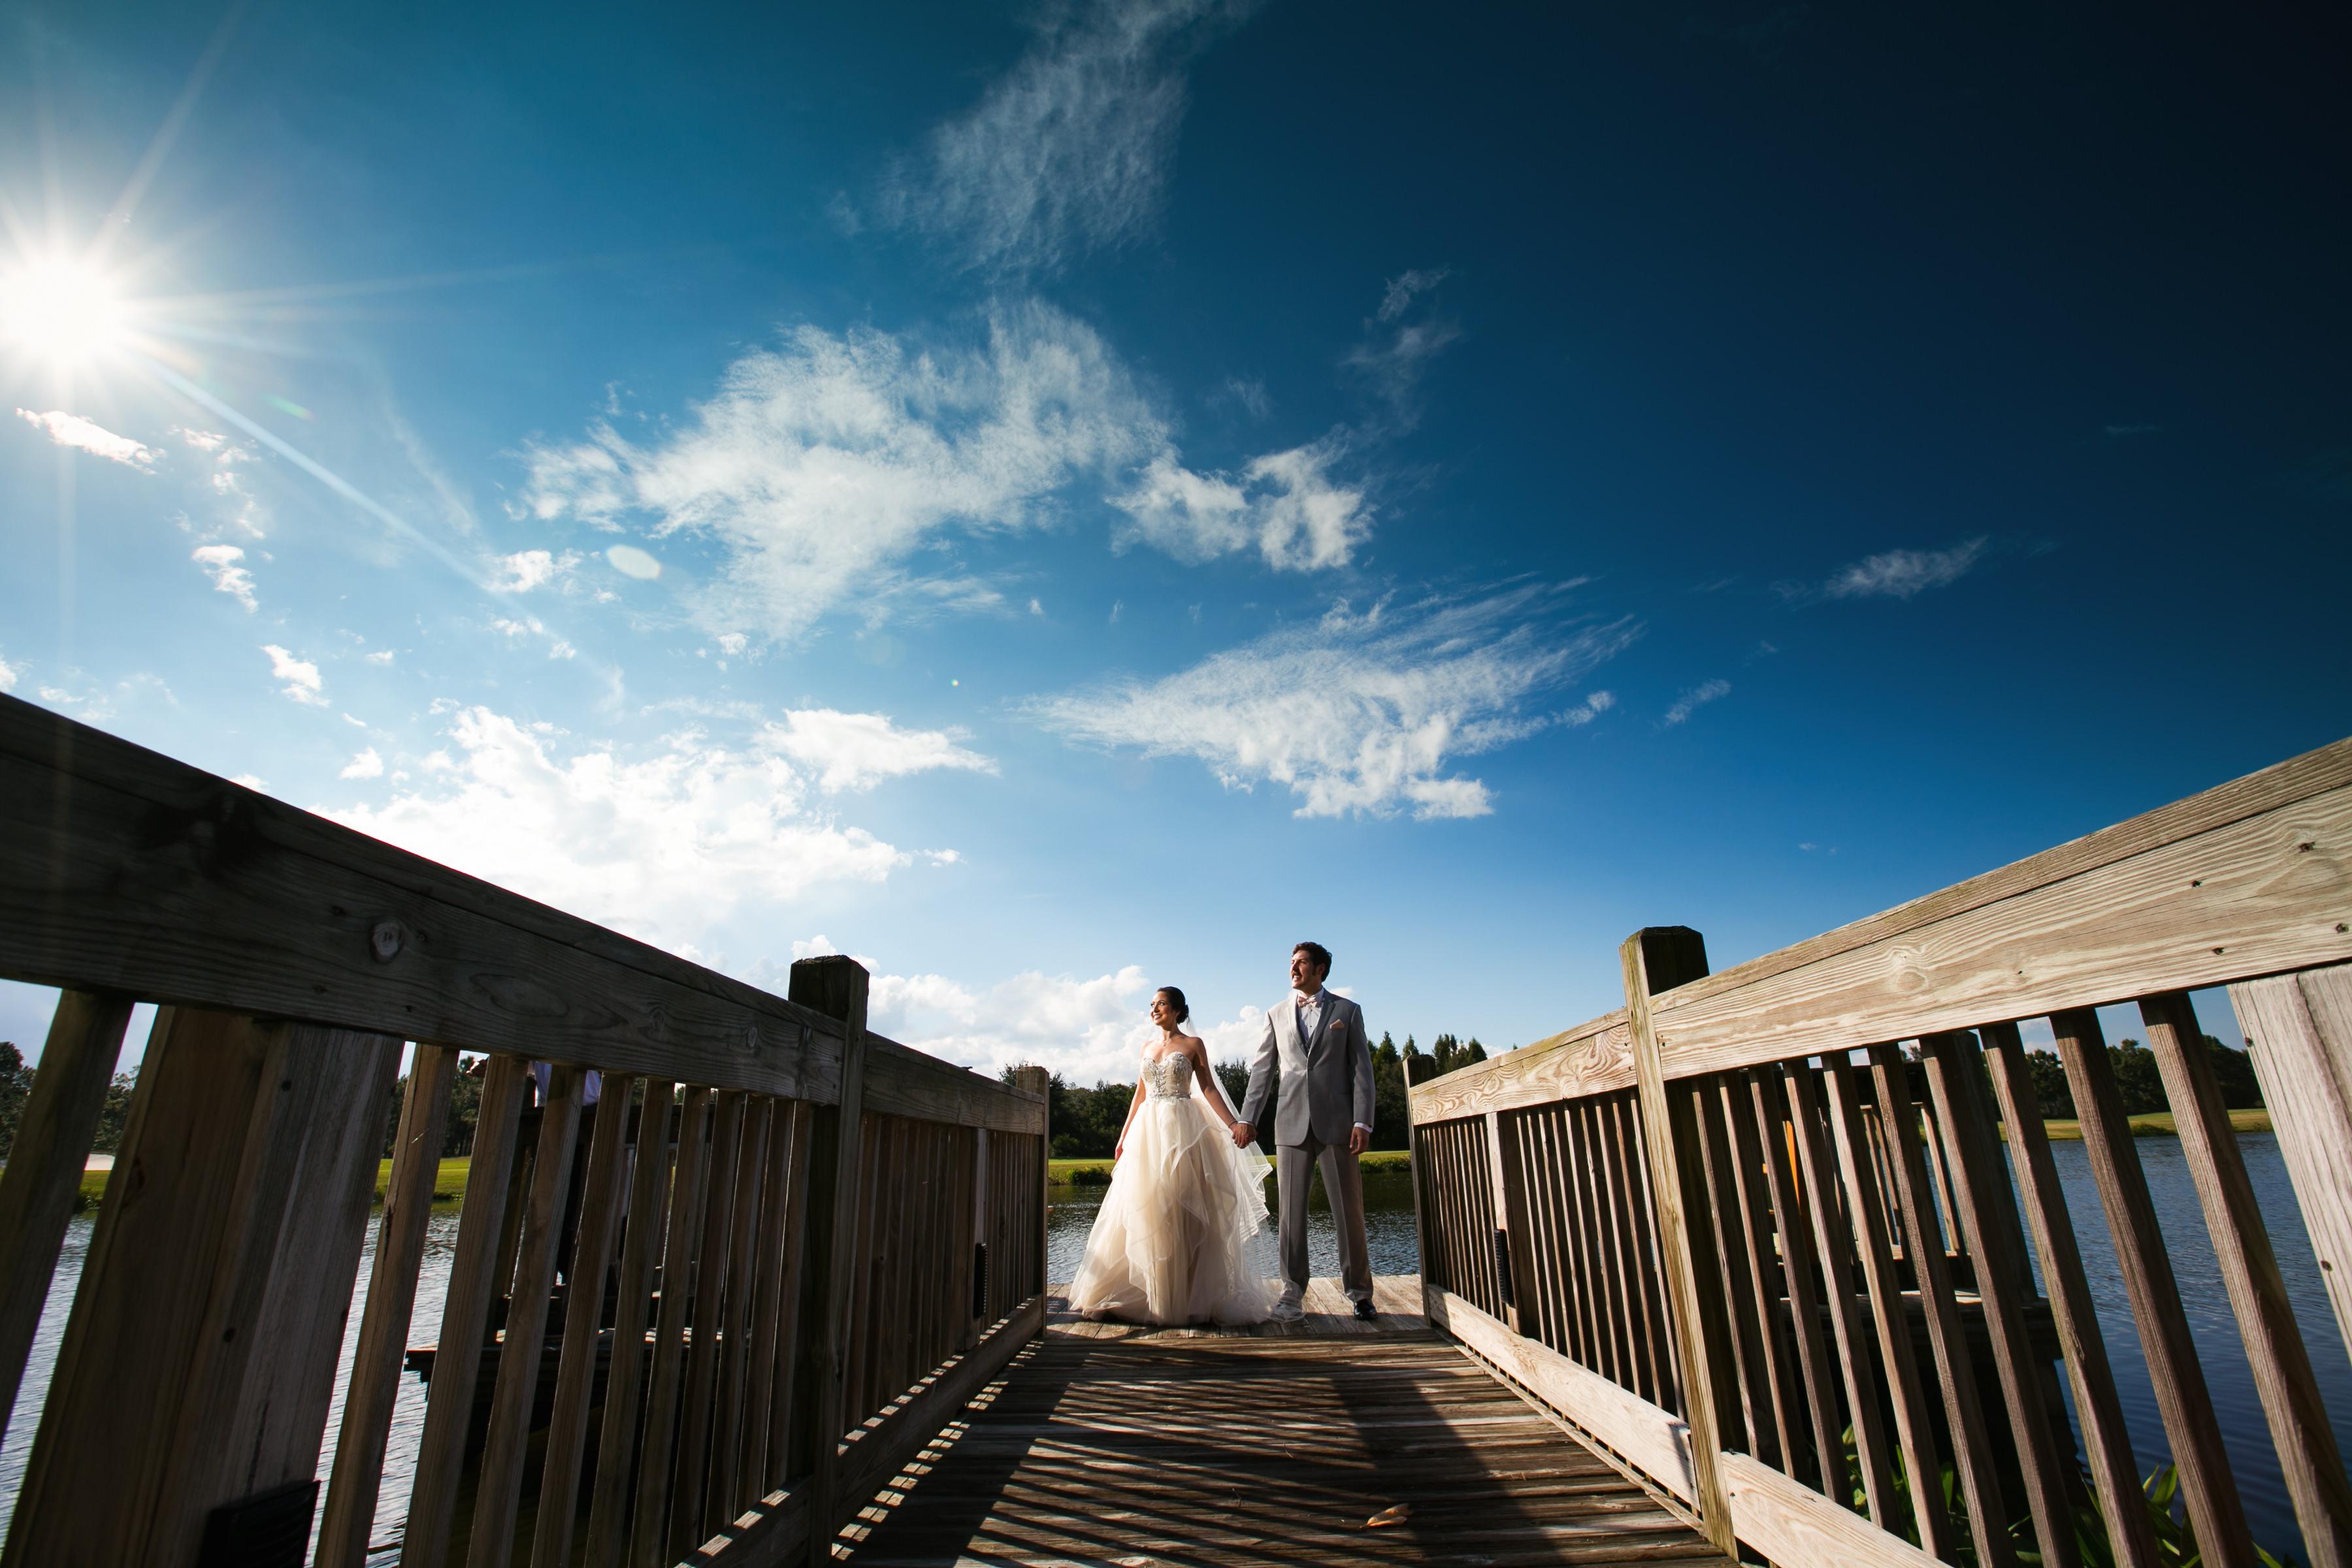 151010-Falcon-Wedding-3466-Edit